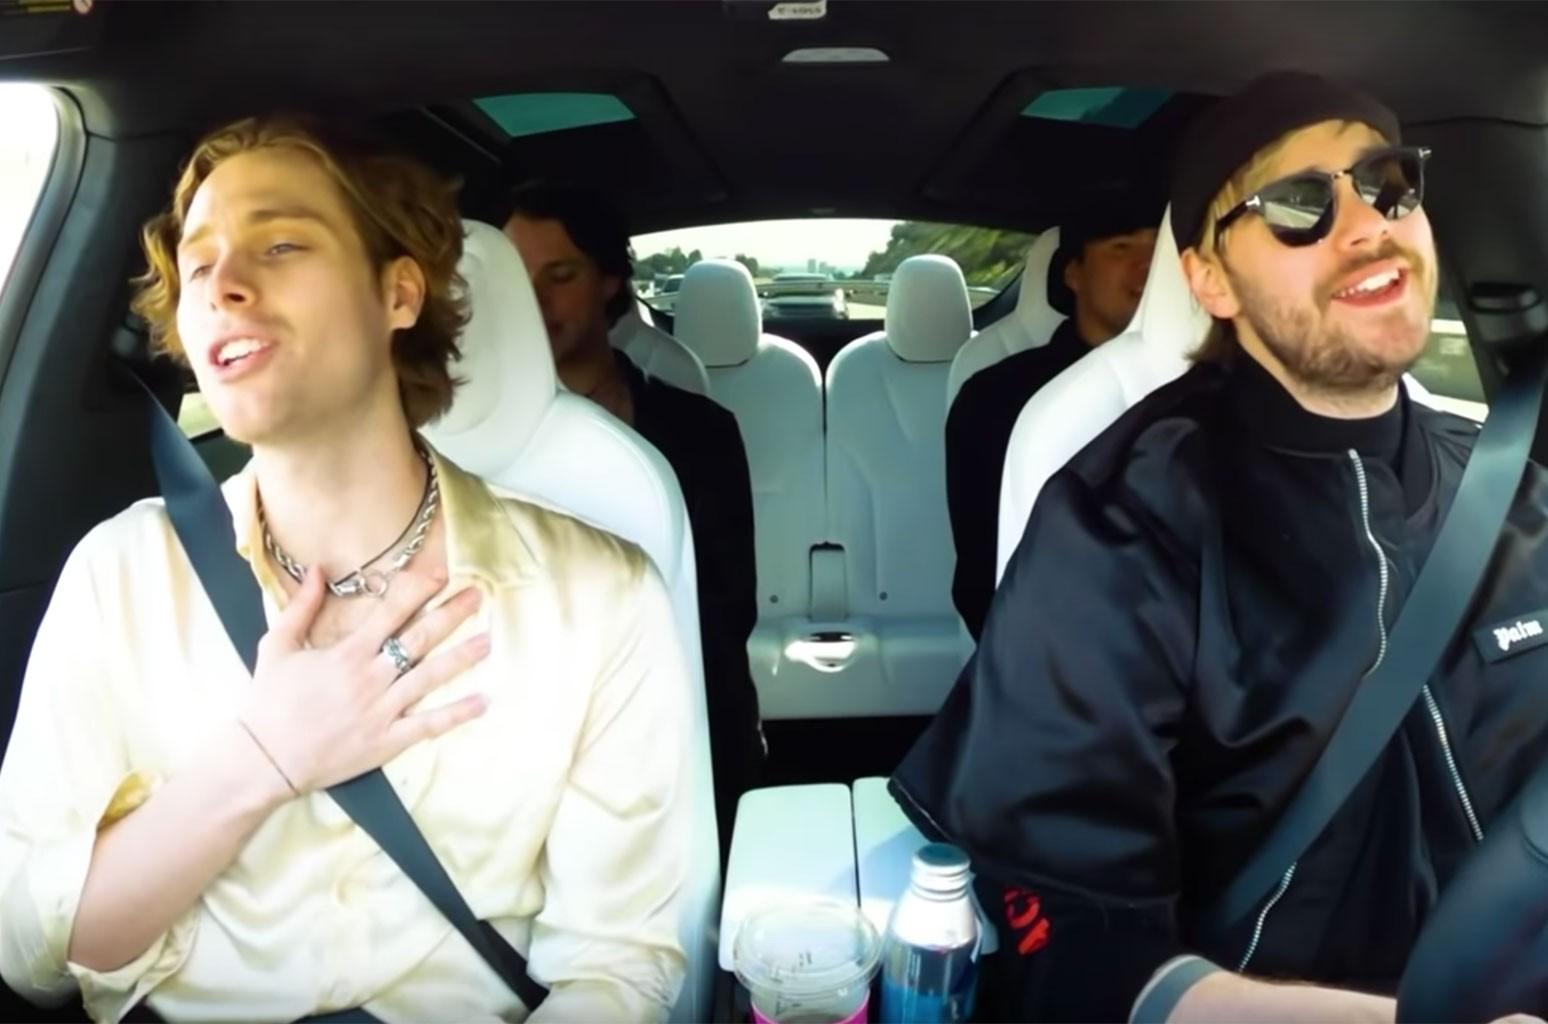 5 Seconds of Summer Carpool Karabloke